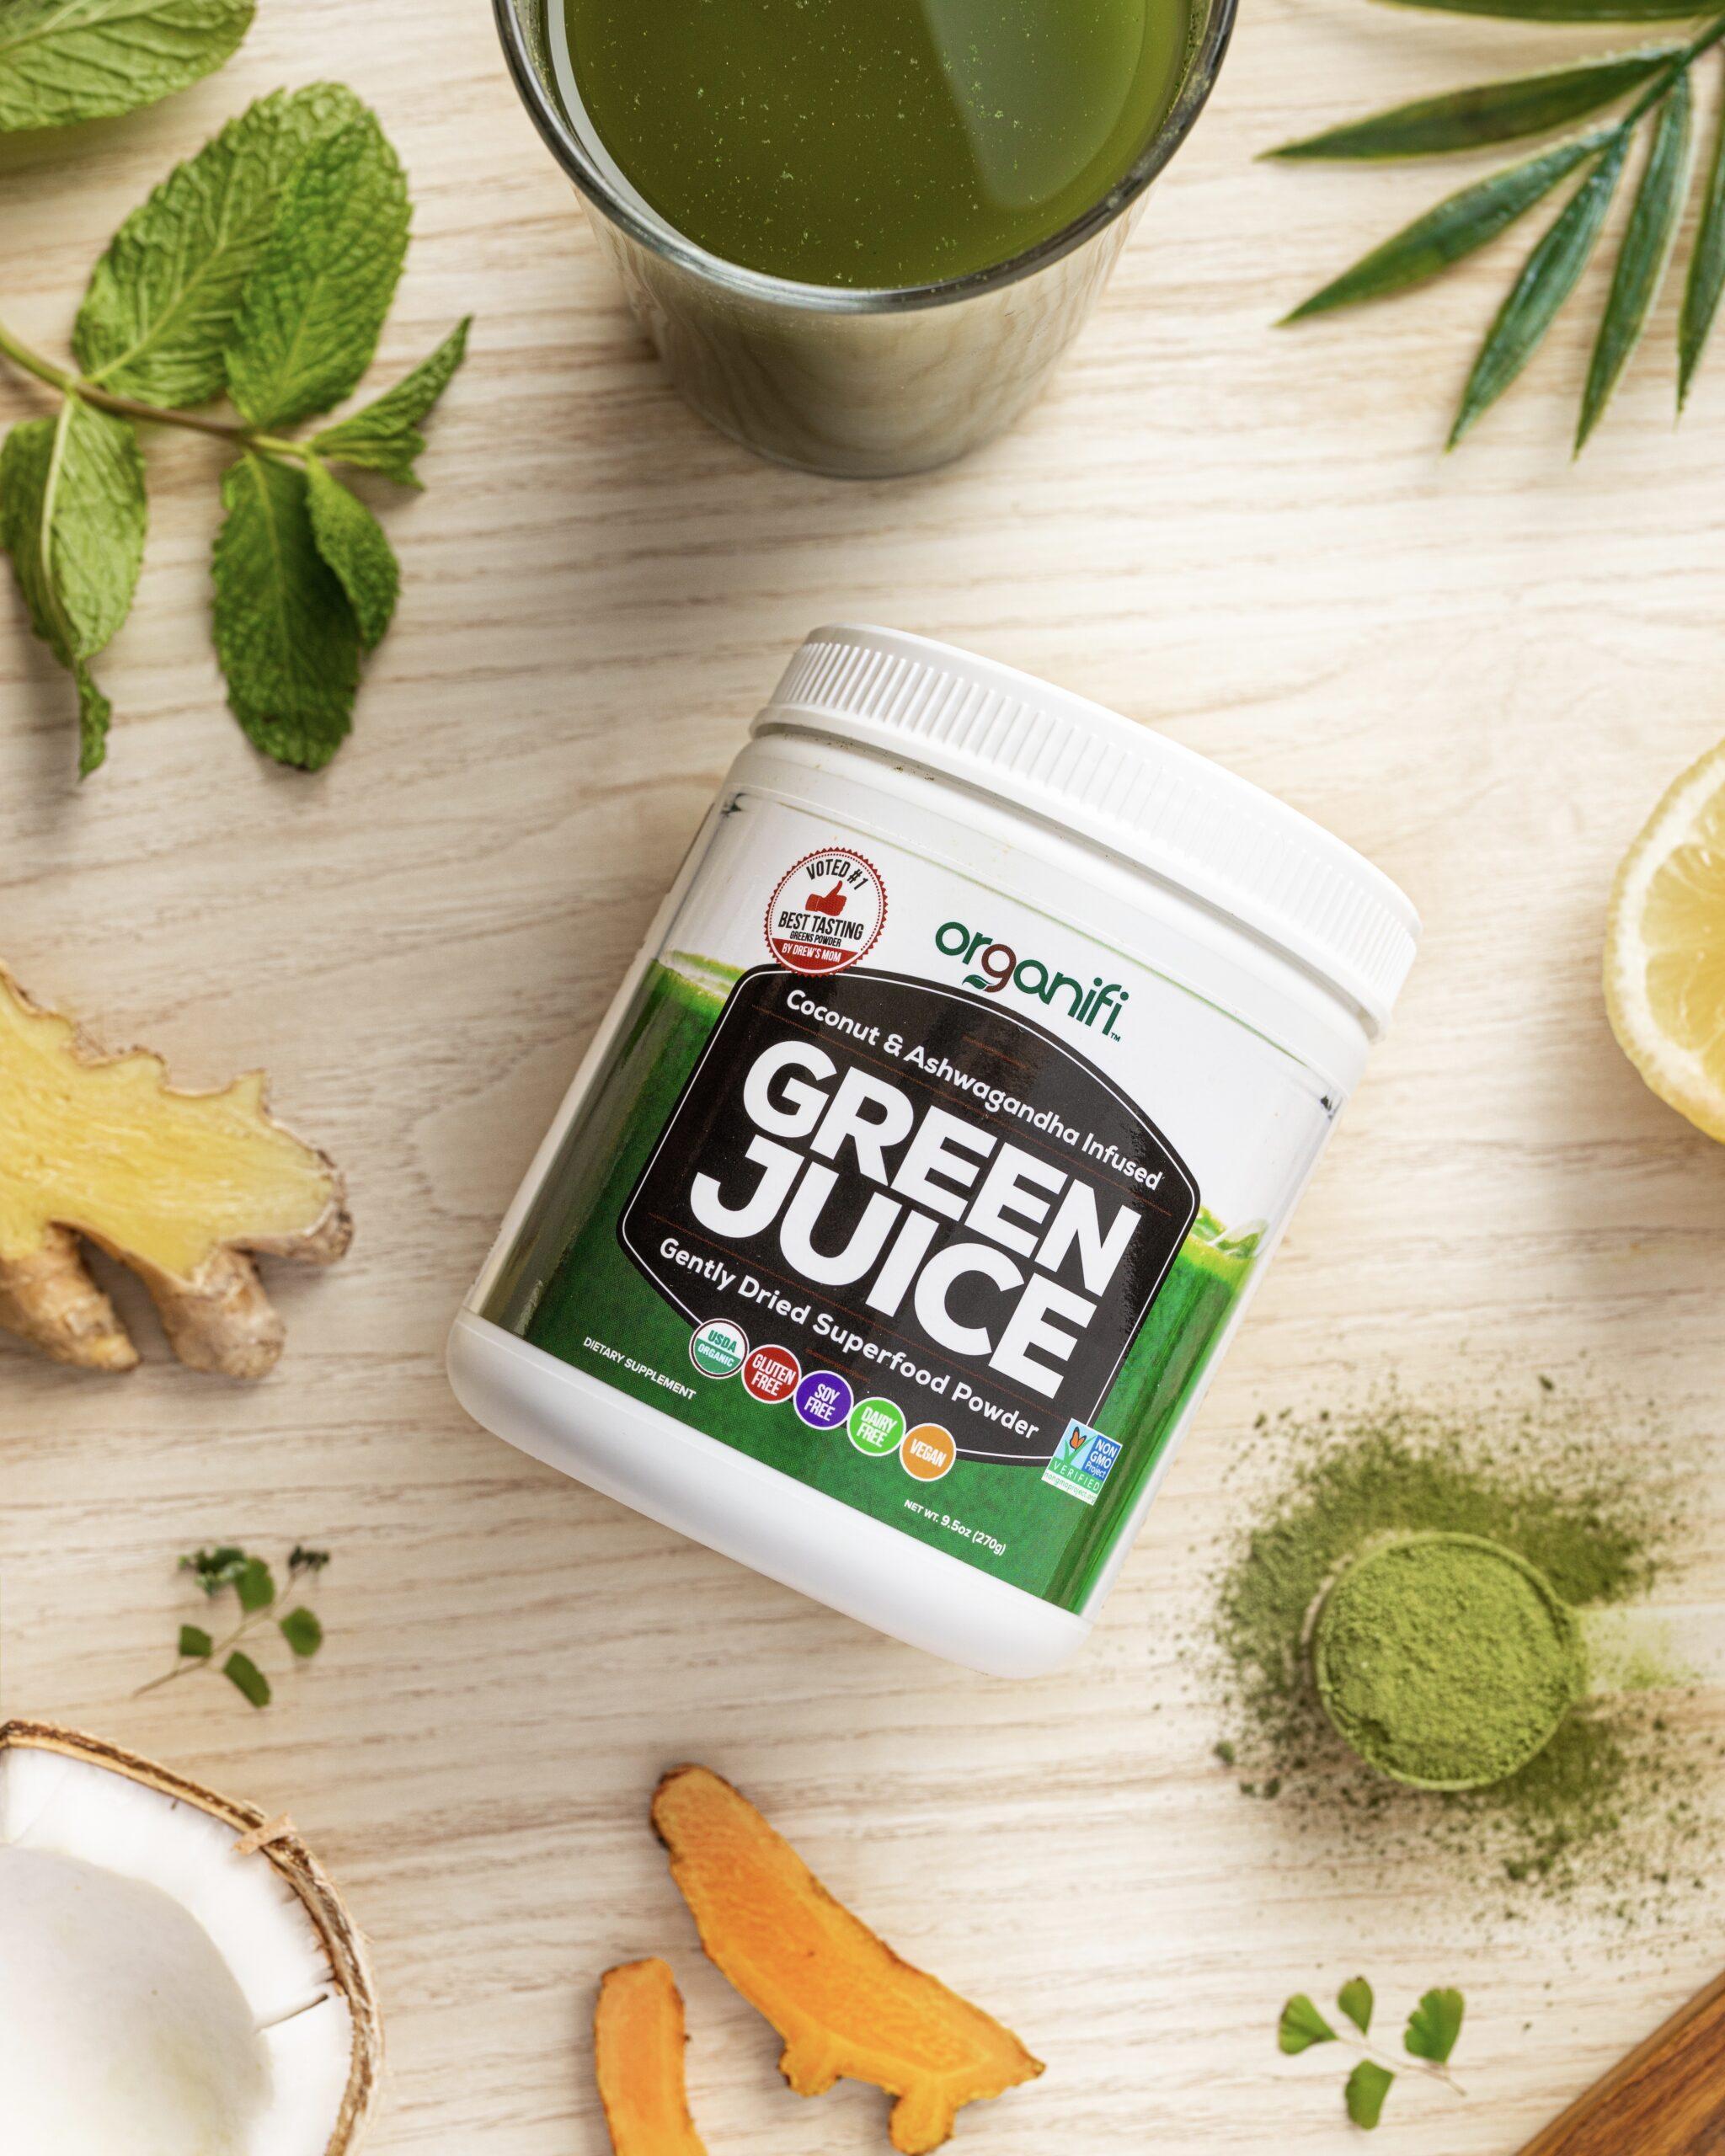 Organifi Green Juice